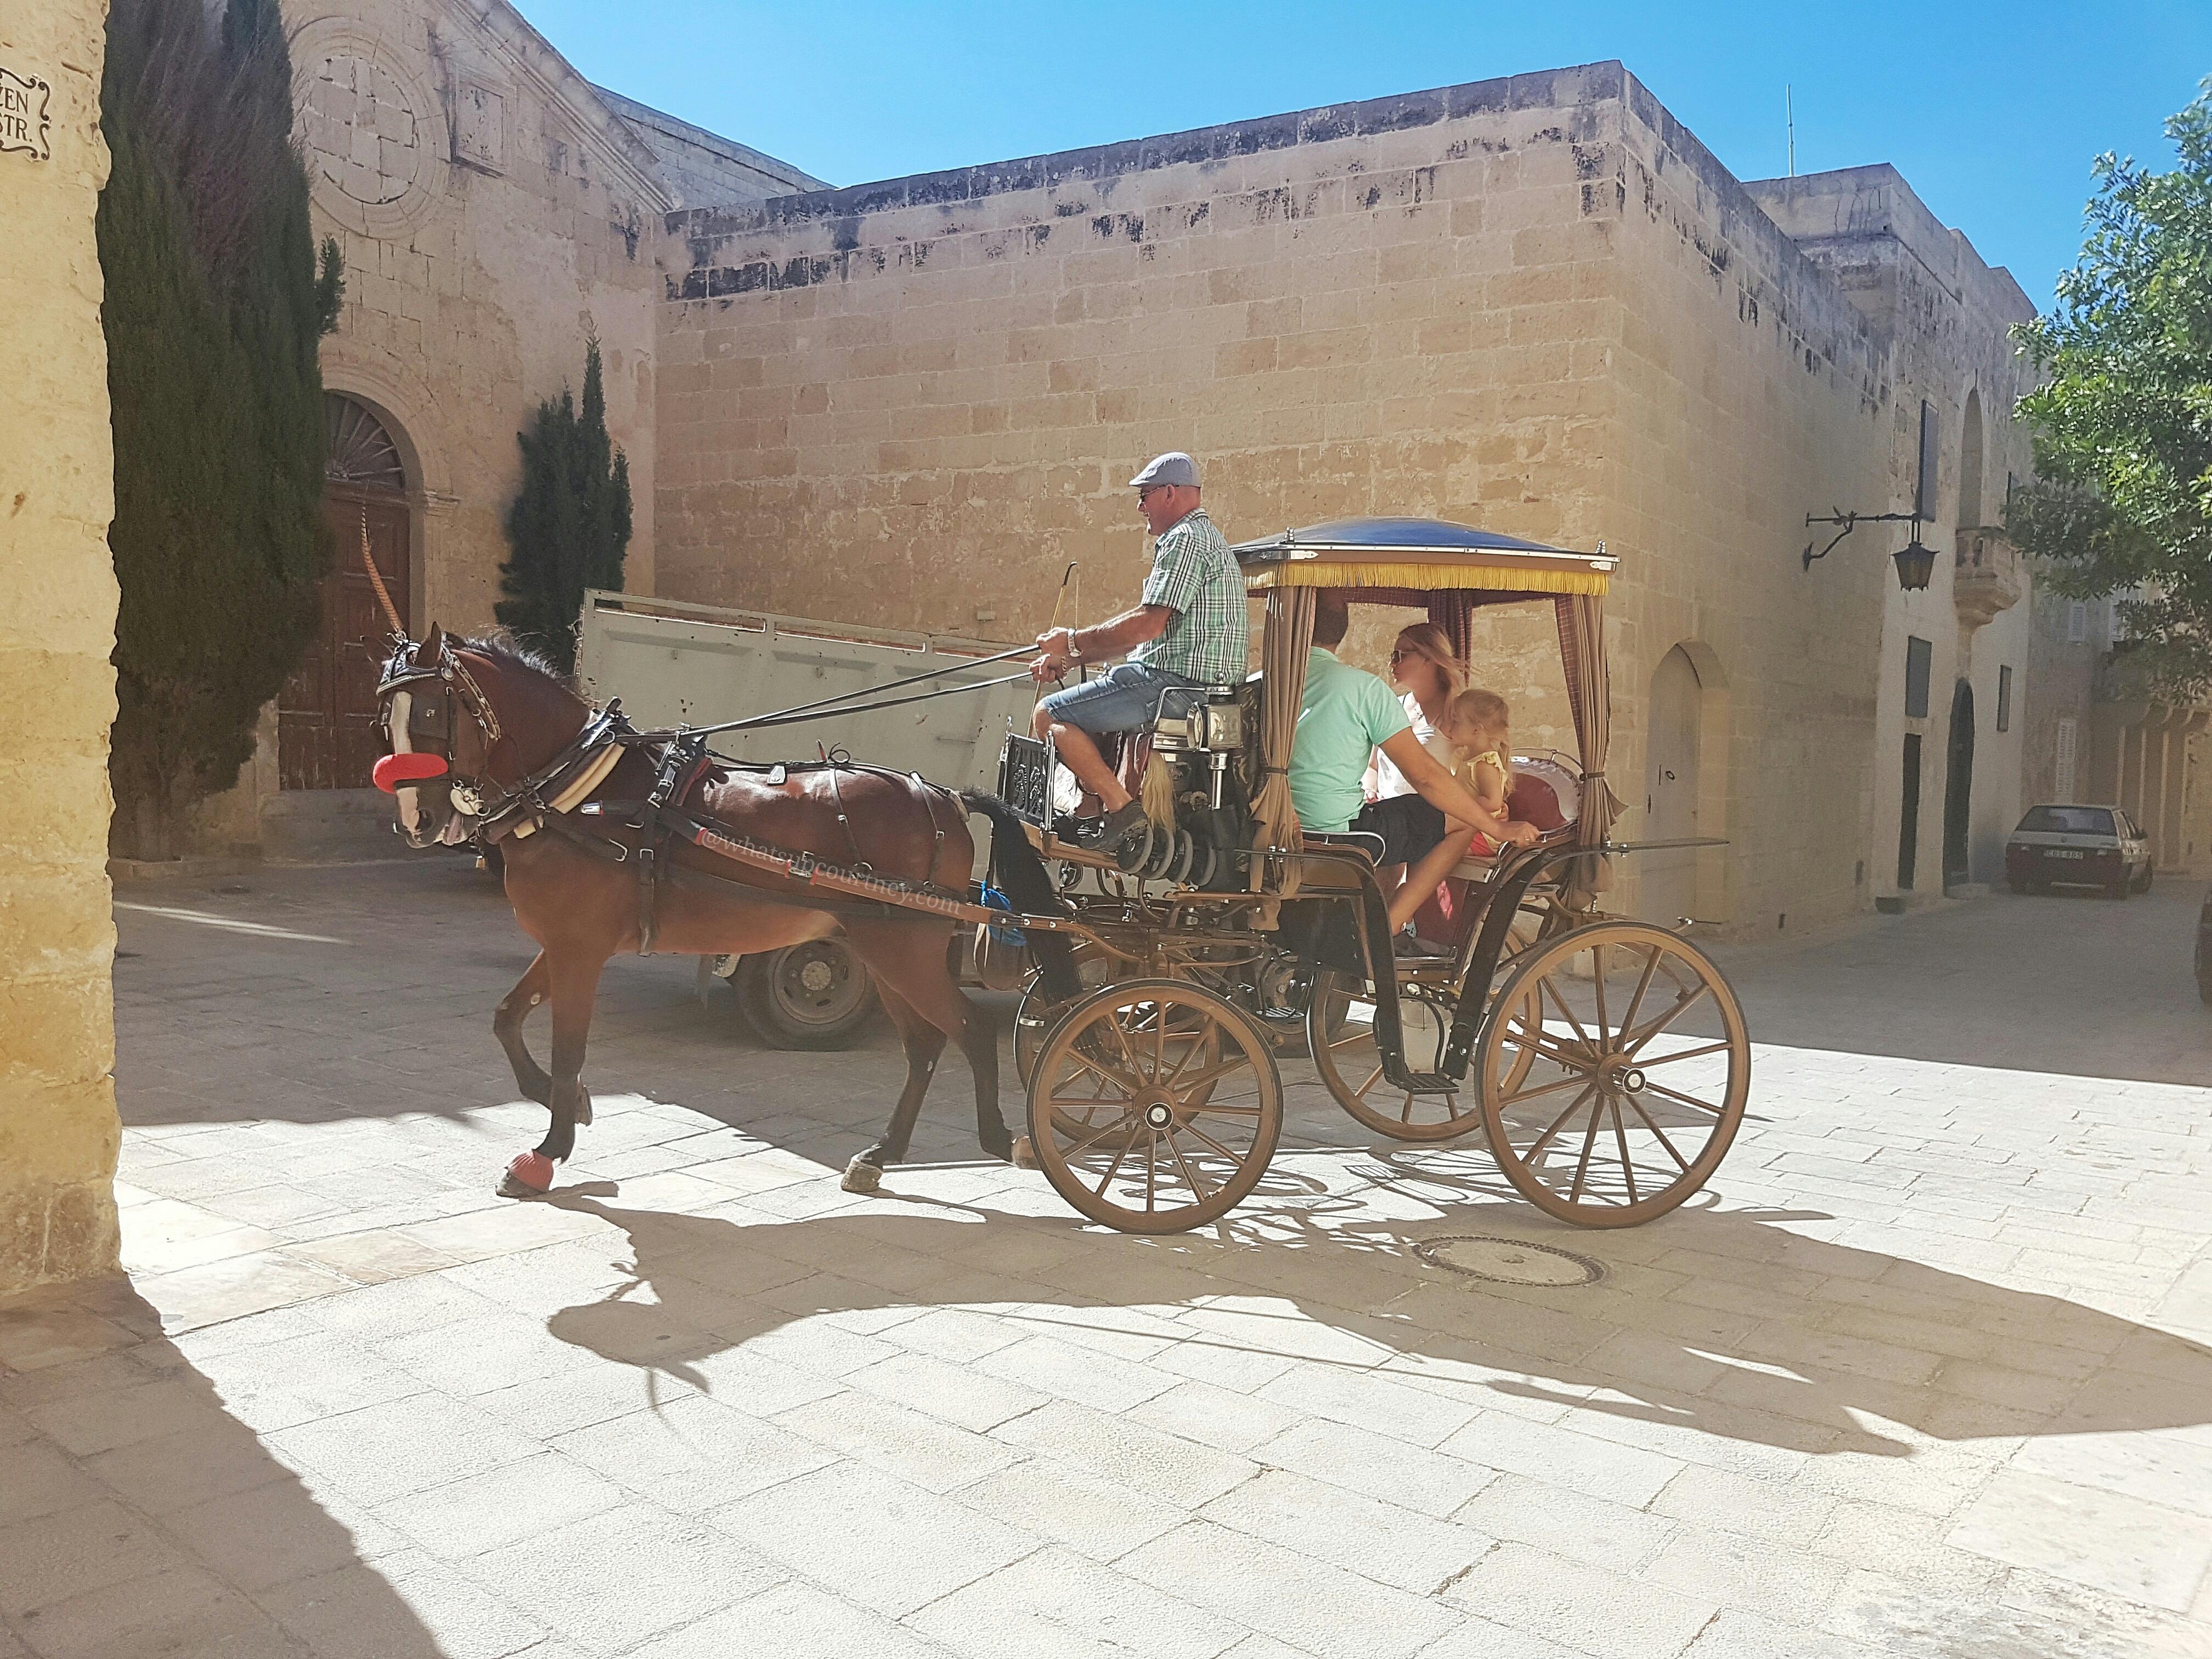 @www.whatsupcourtney.com Malta: Mdina and Haqar Qim